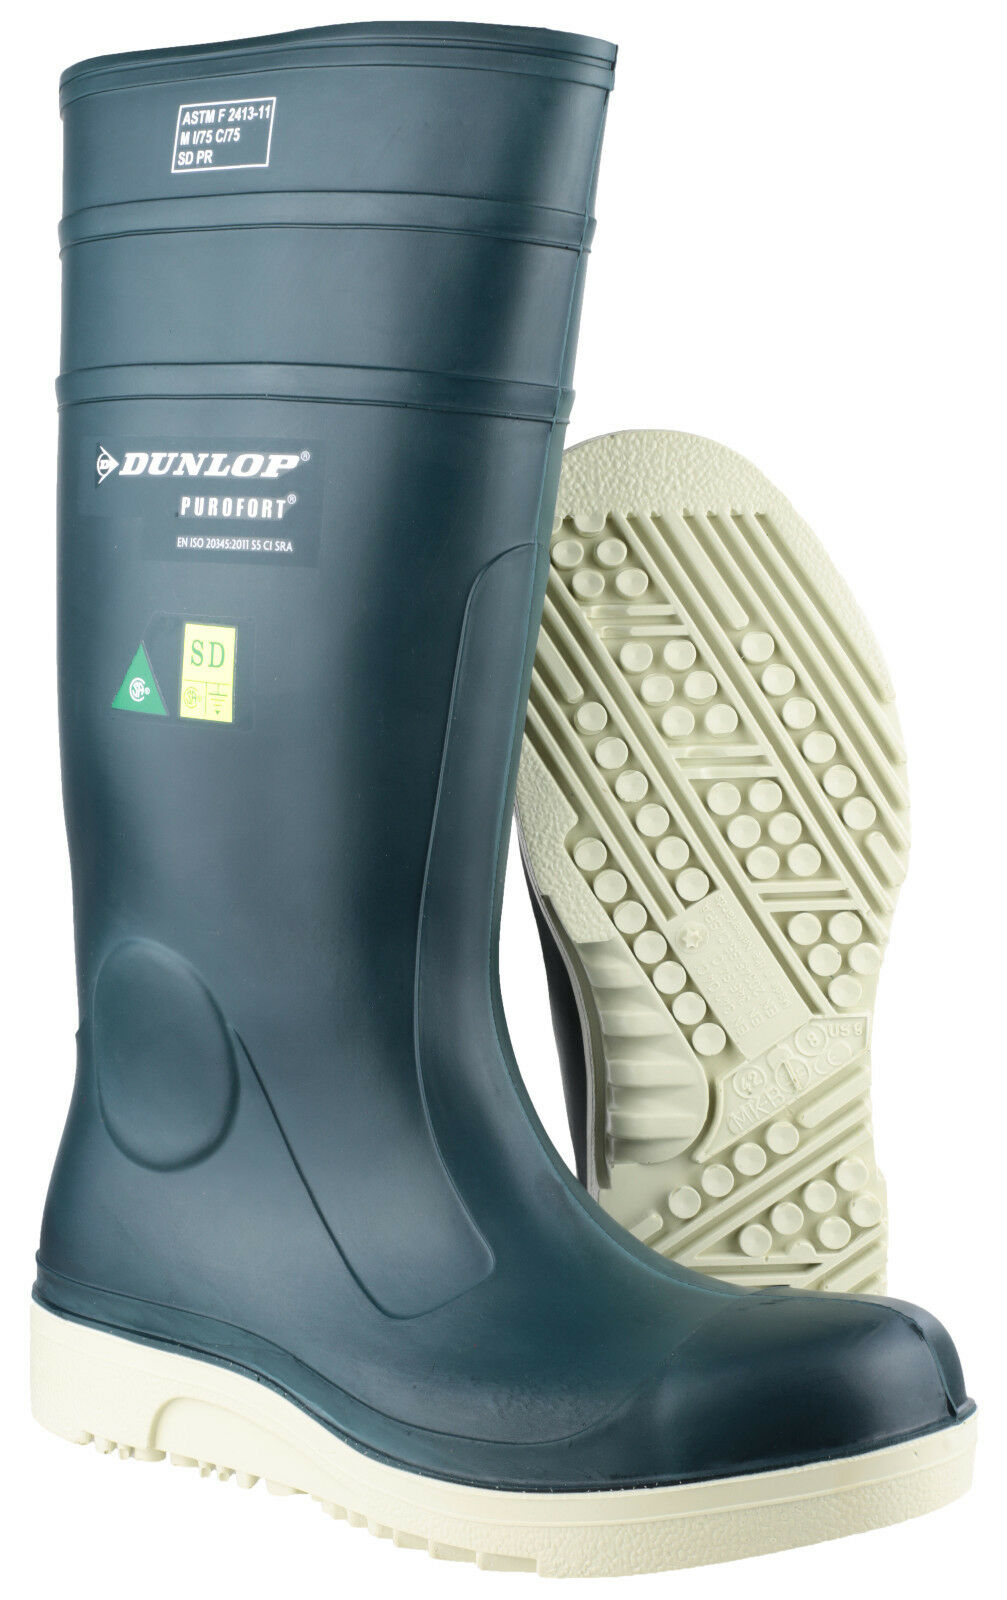 Dunlop Purofort Unisex Comfort Grip Completo Di Sicurezza Unisex Purofort Impermeabili Wellingtons uk3-12 c8e280